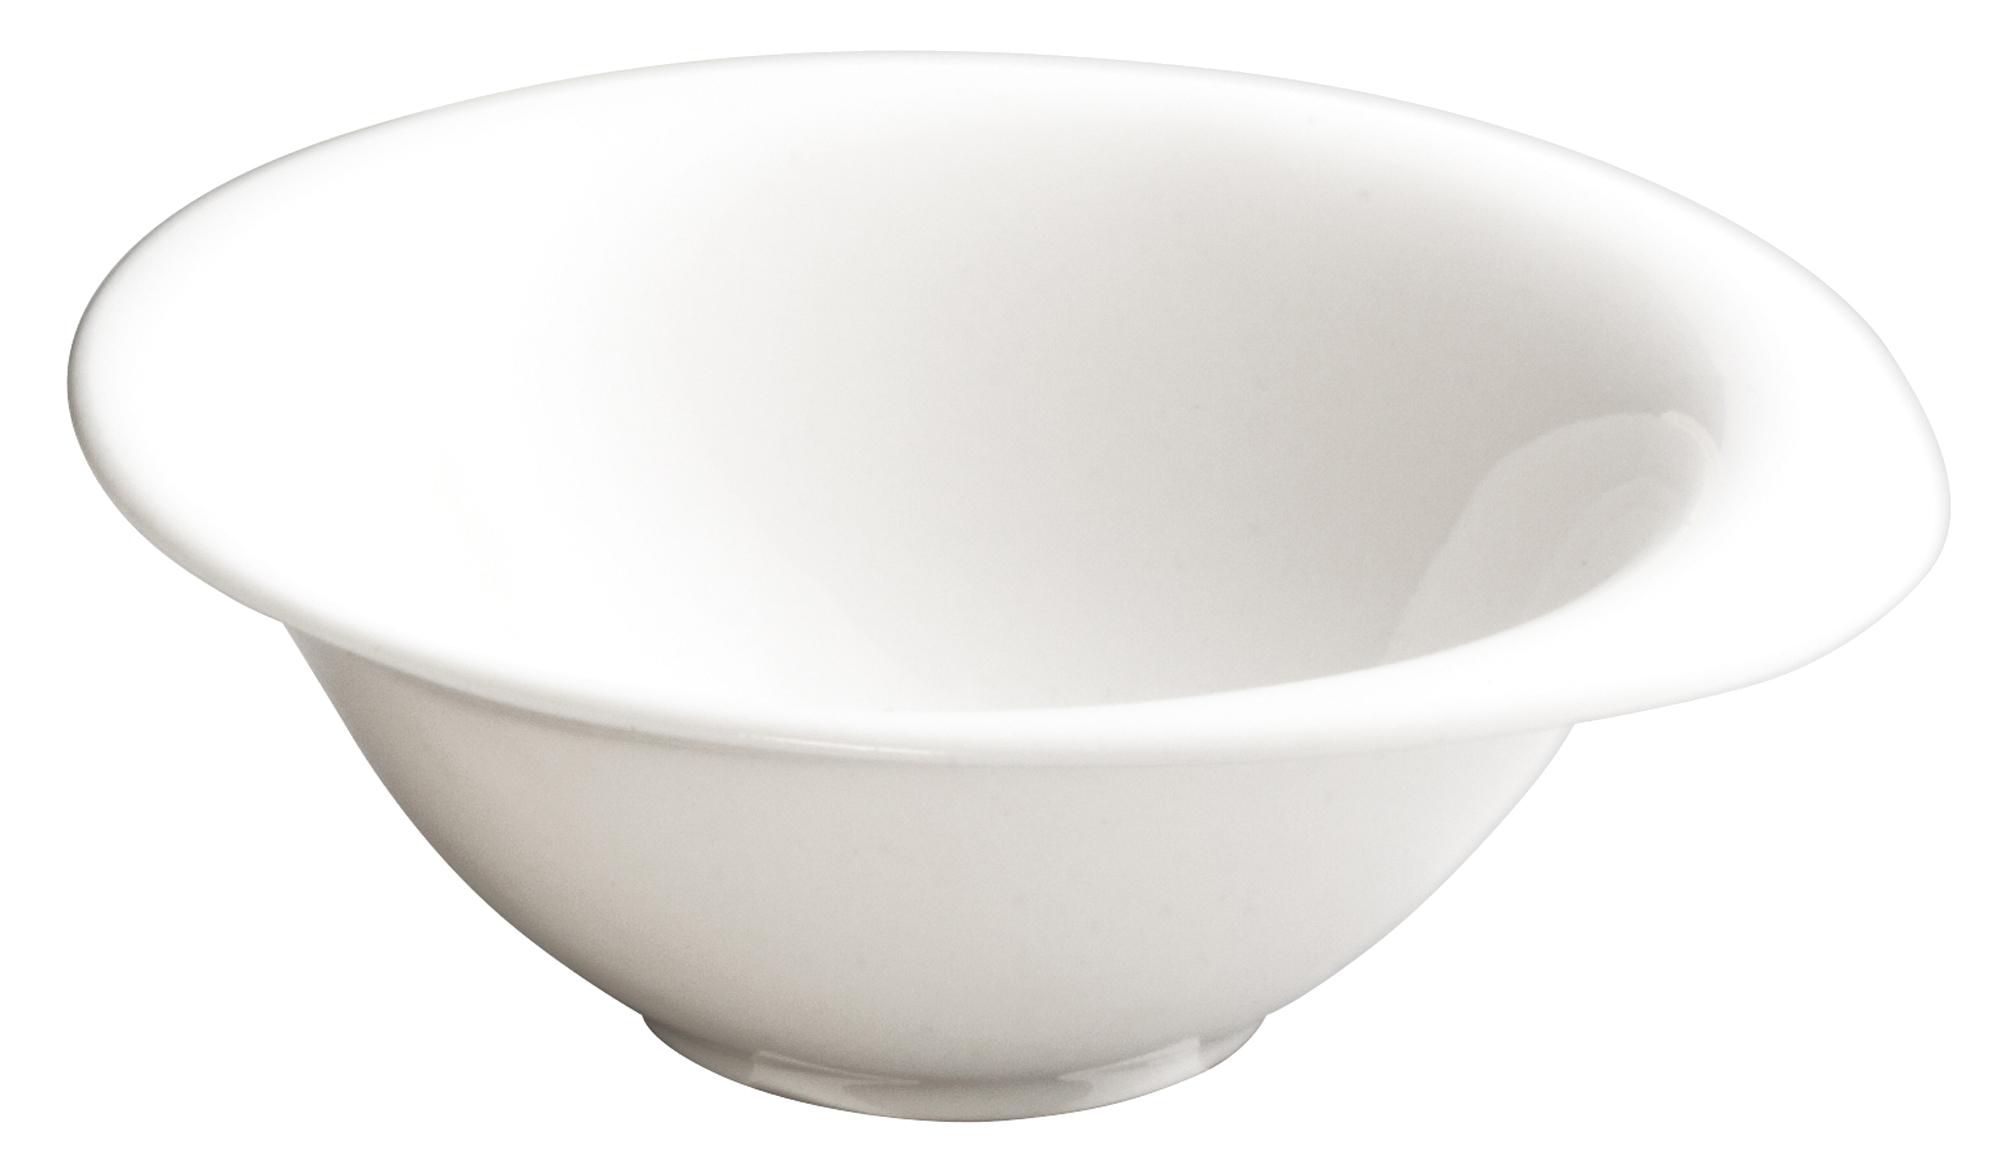 Winco WDP004-206 china, bowl,  9 - 16 oz